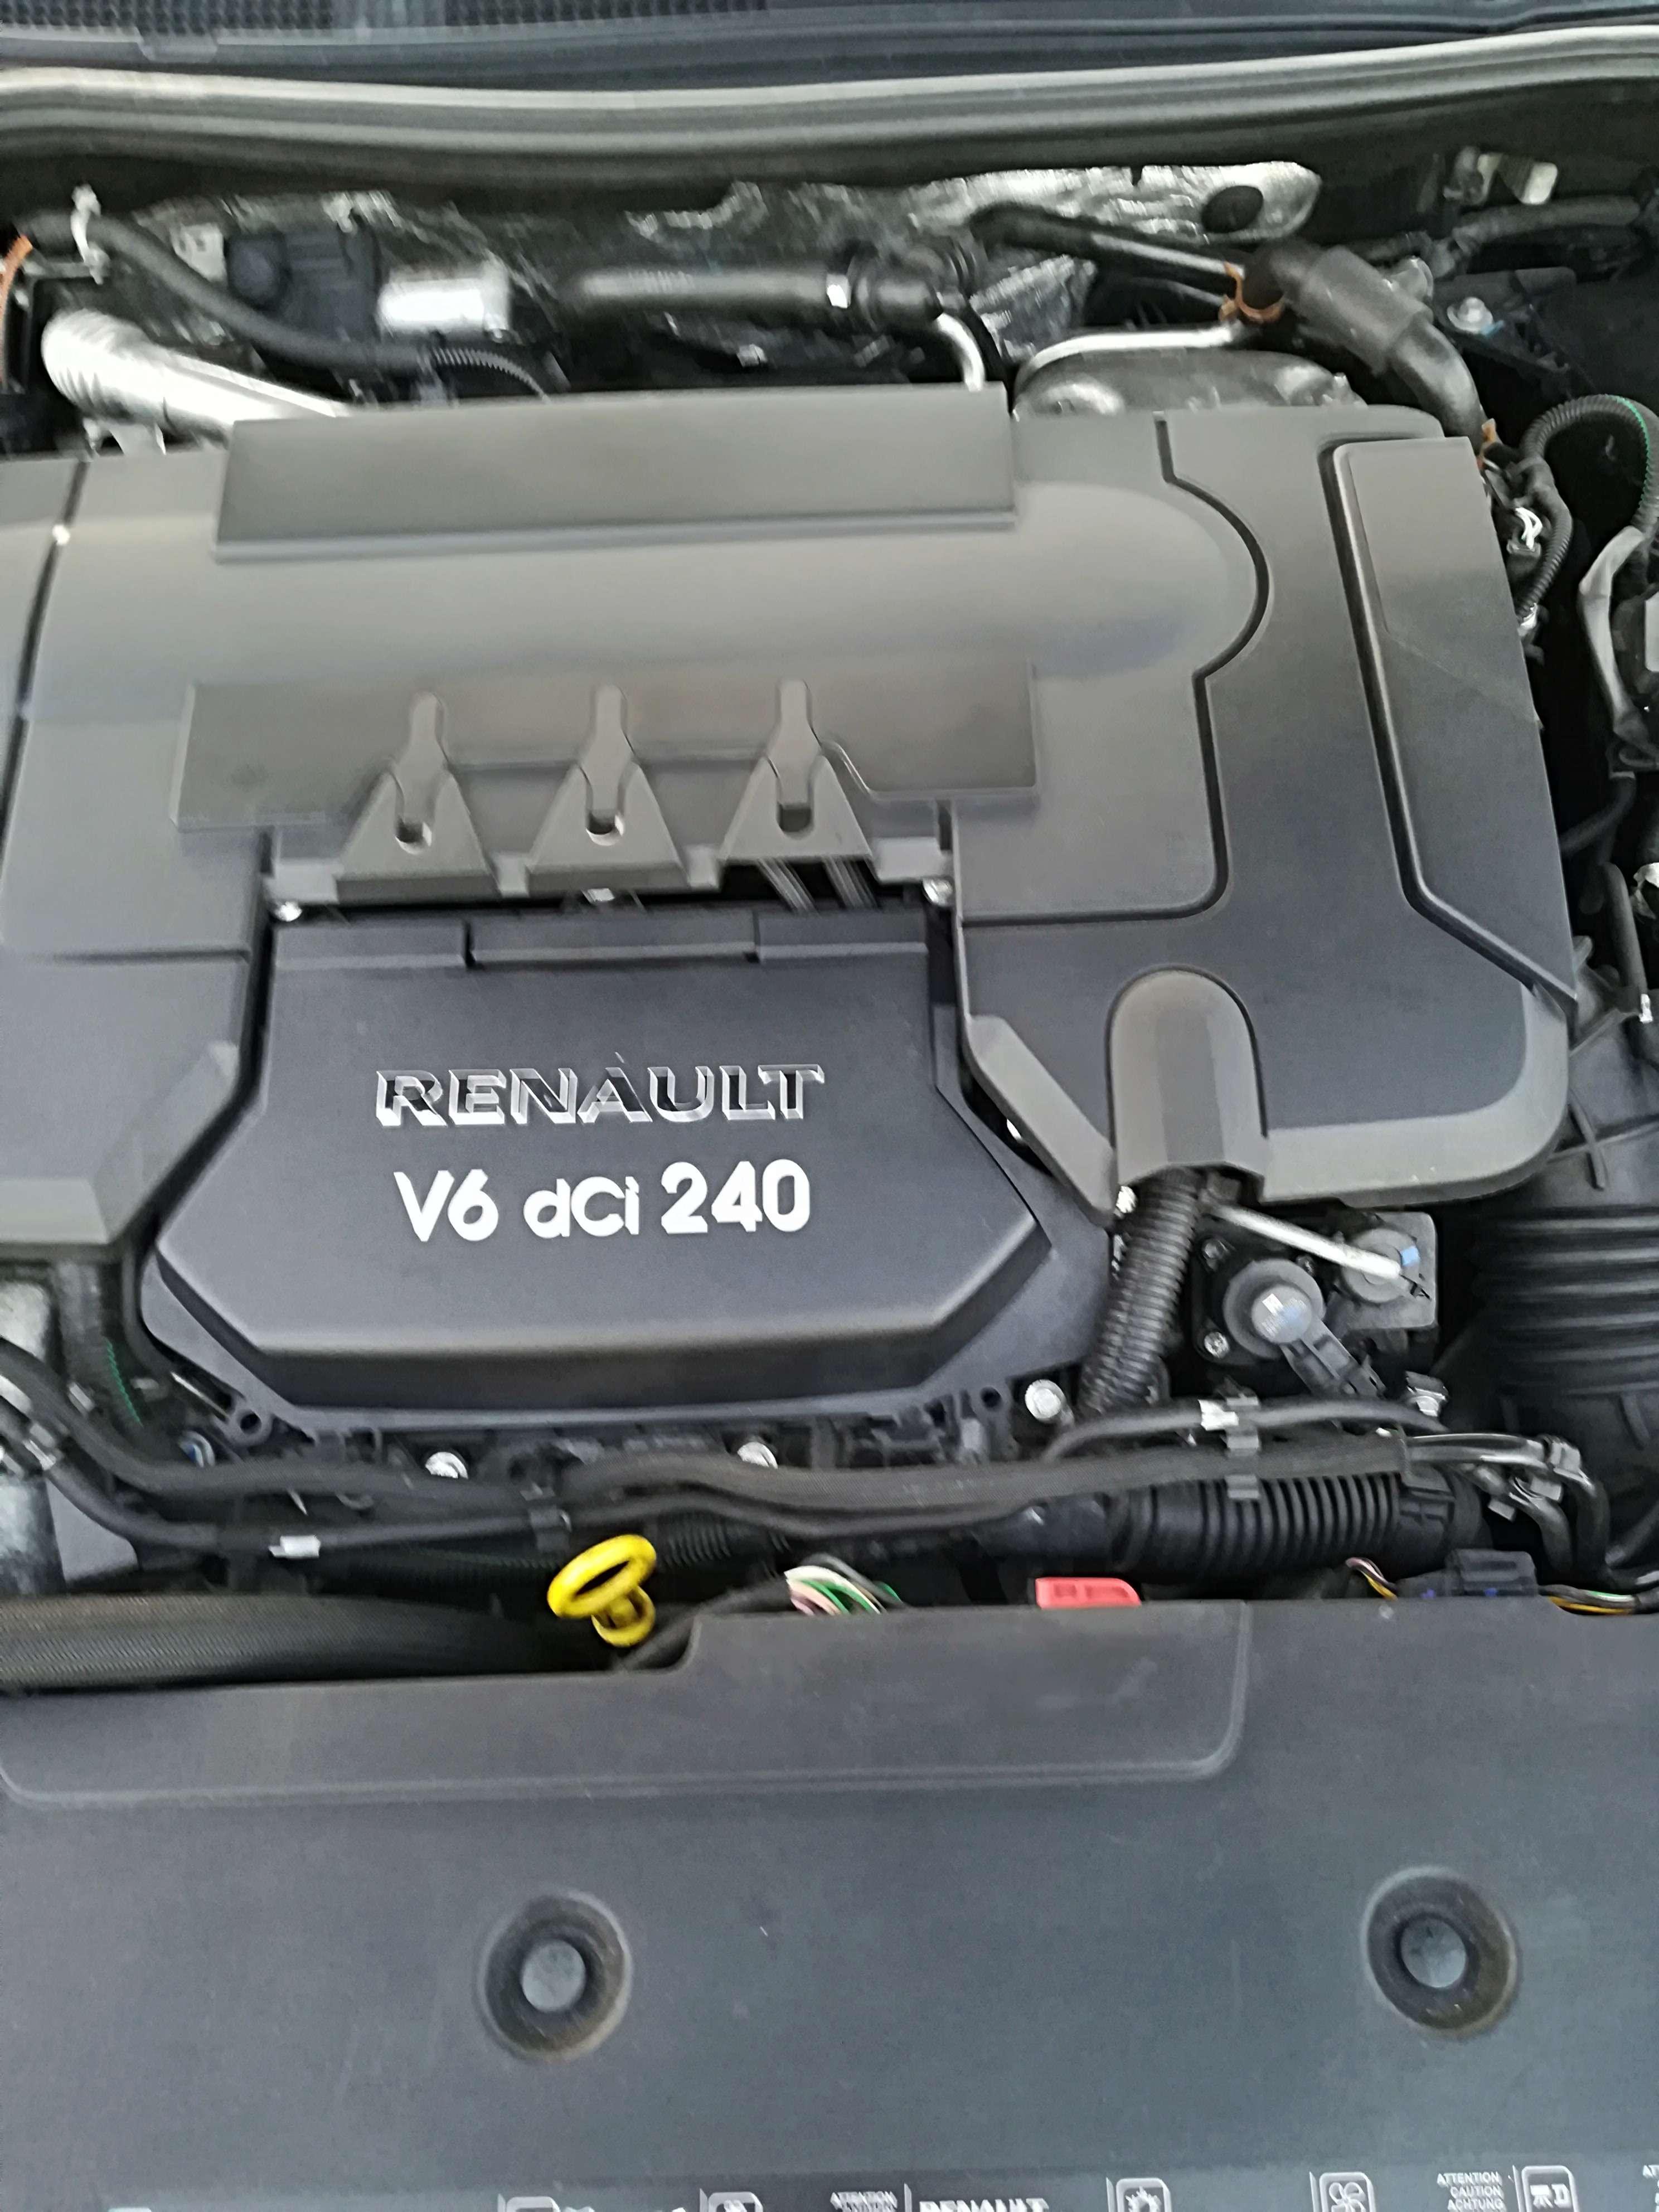 [manue68] Laguna III.2 Coupé Initiale Paris 3.0 V6 dCi 240 Img_2017